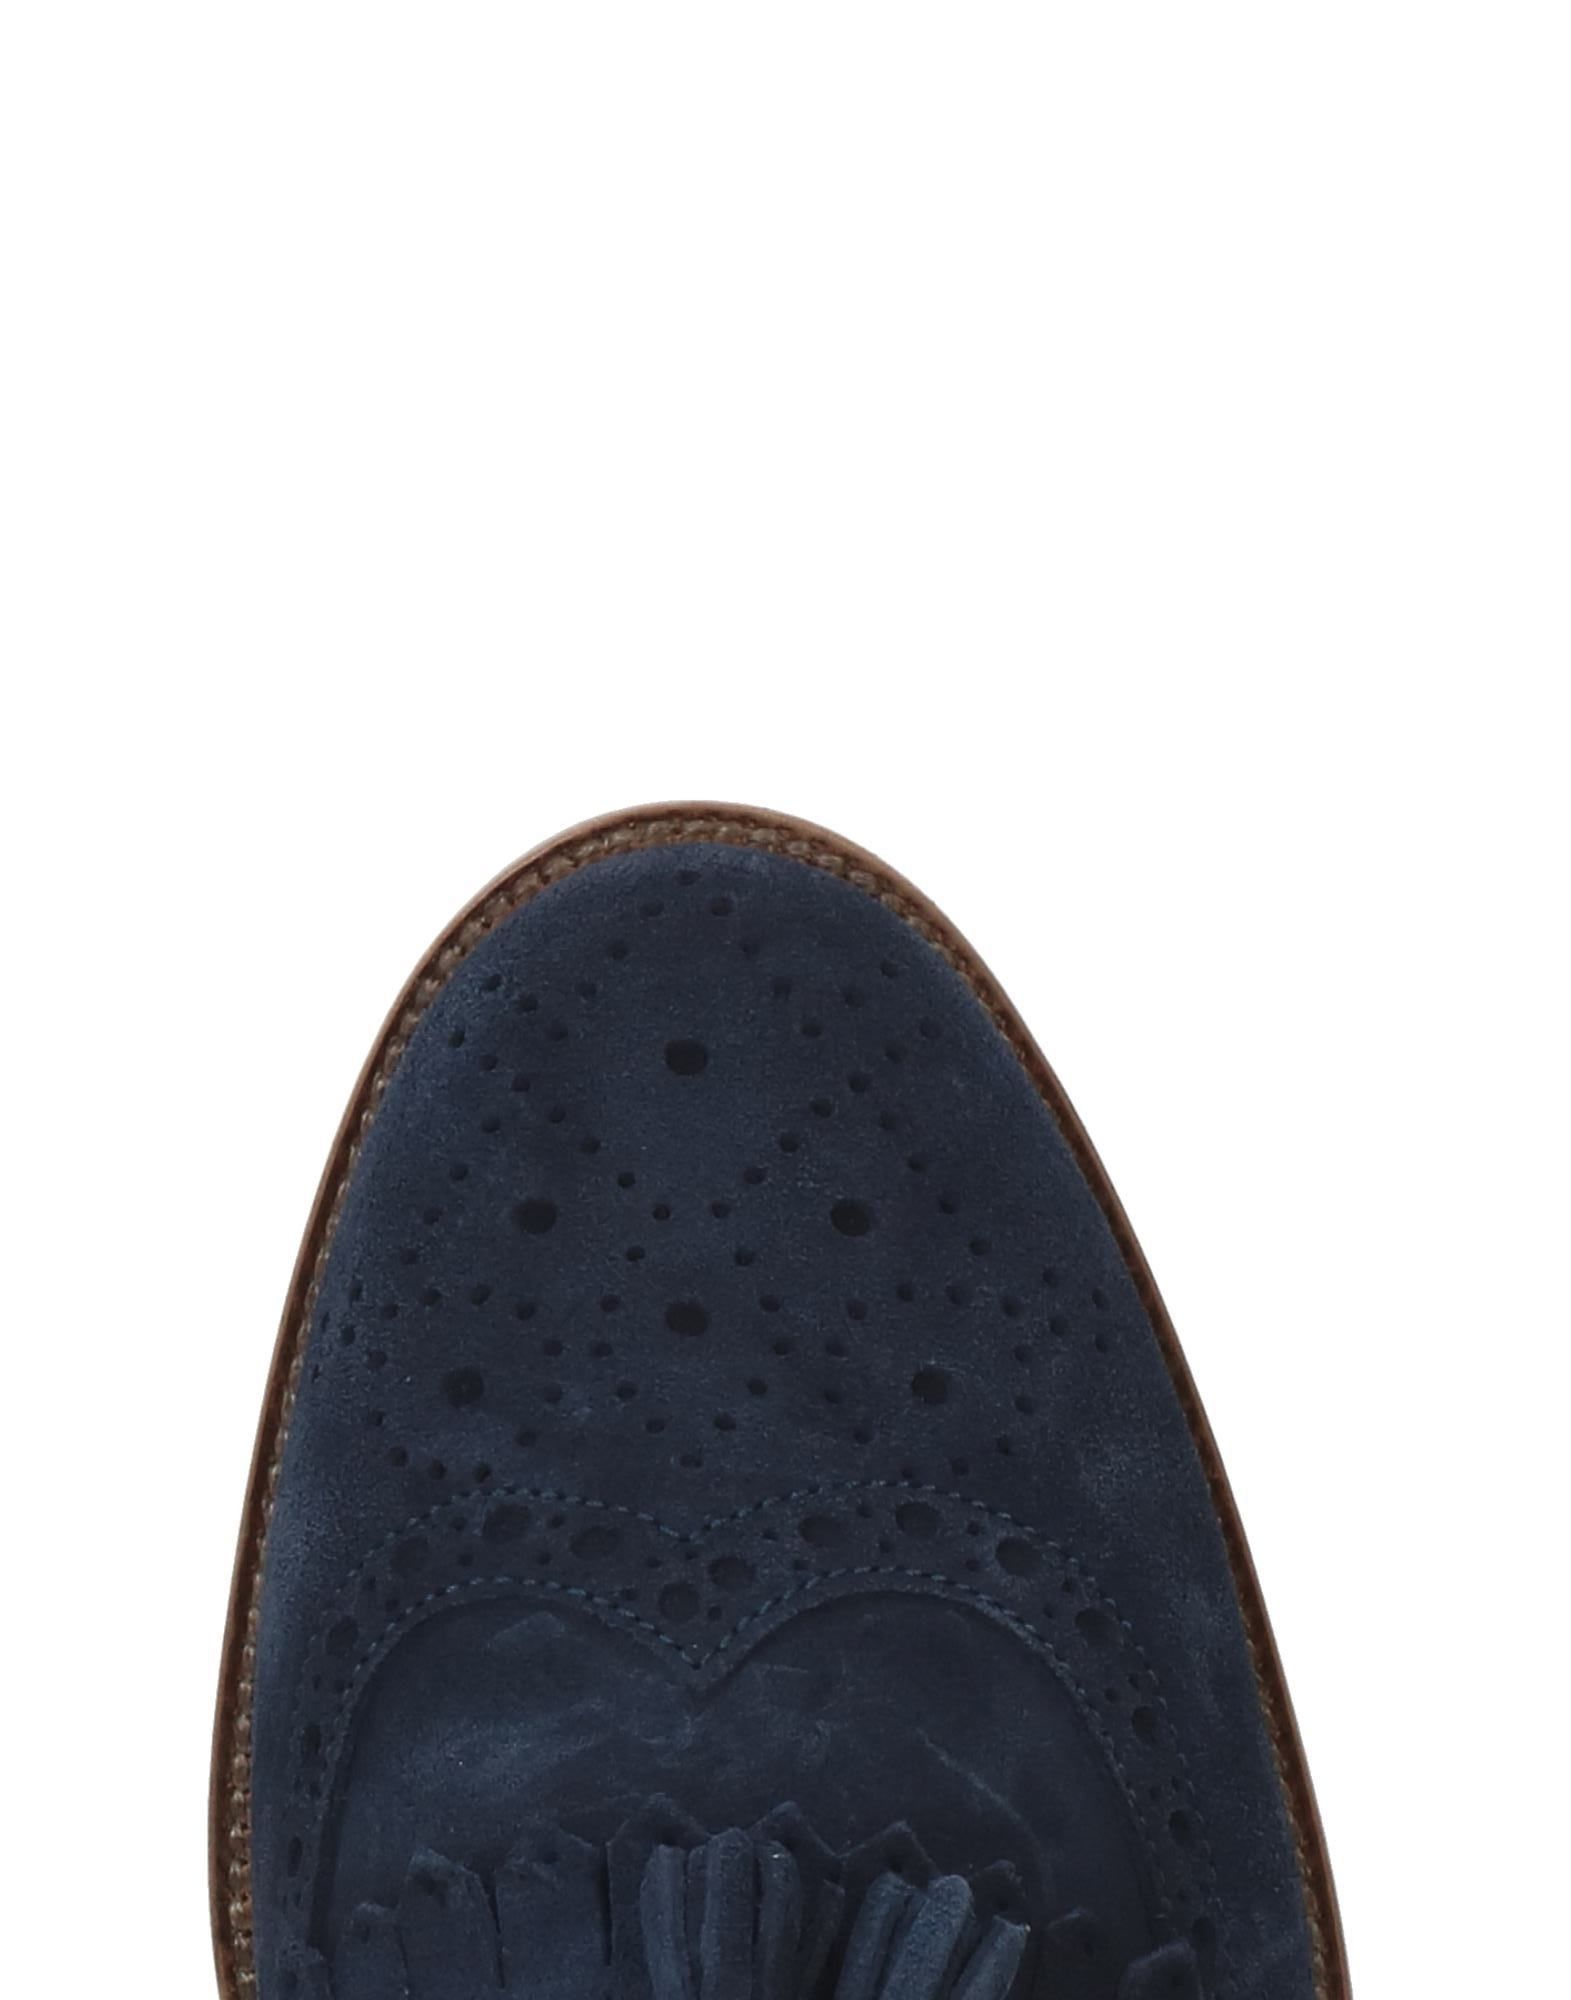 Belsire Herren Mokassins Herren Belsire  11336611IB Heiße Schuhe 5b89fb